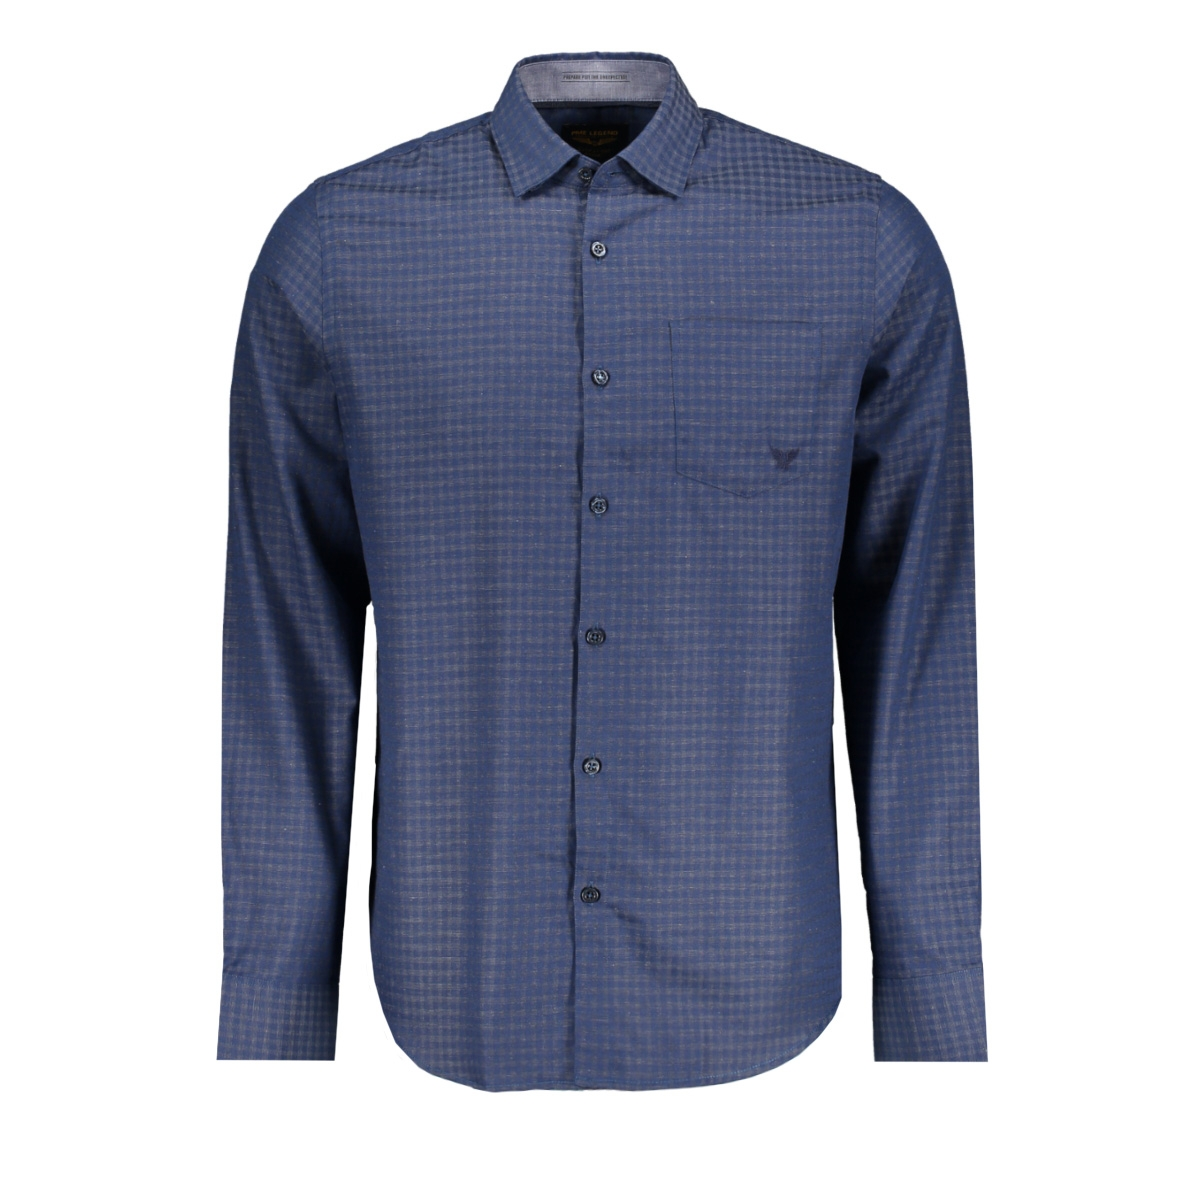 psi188270 pme legend overhemd 5286